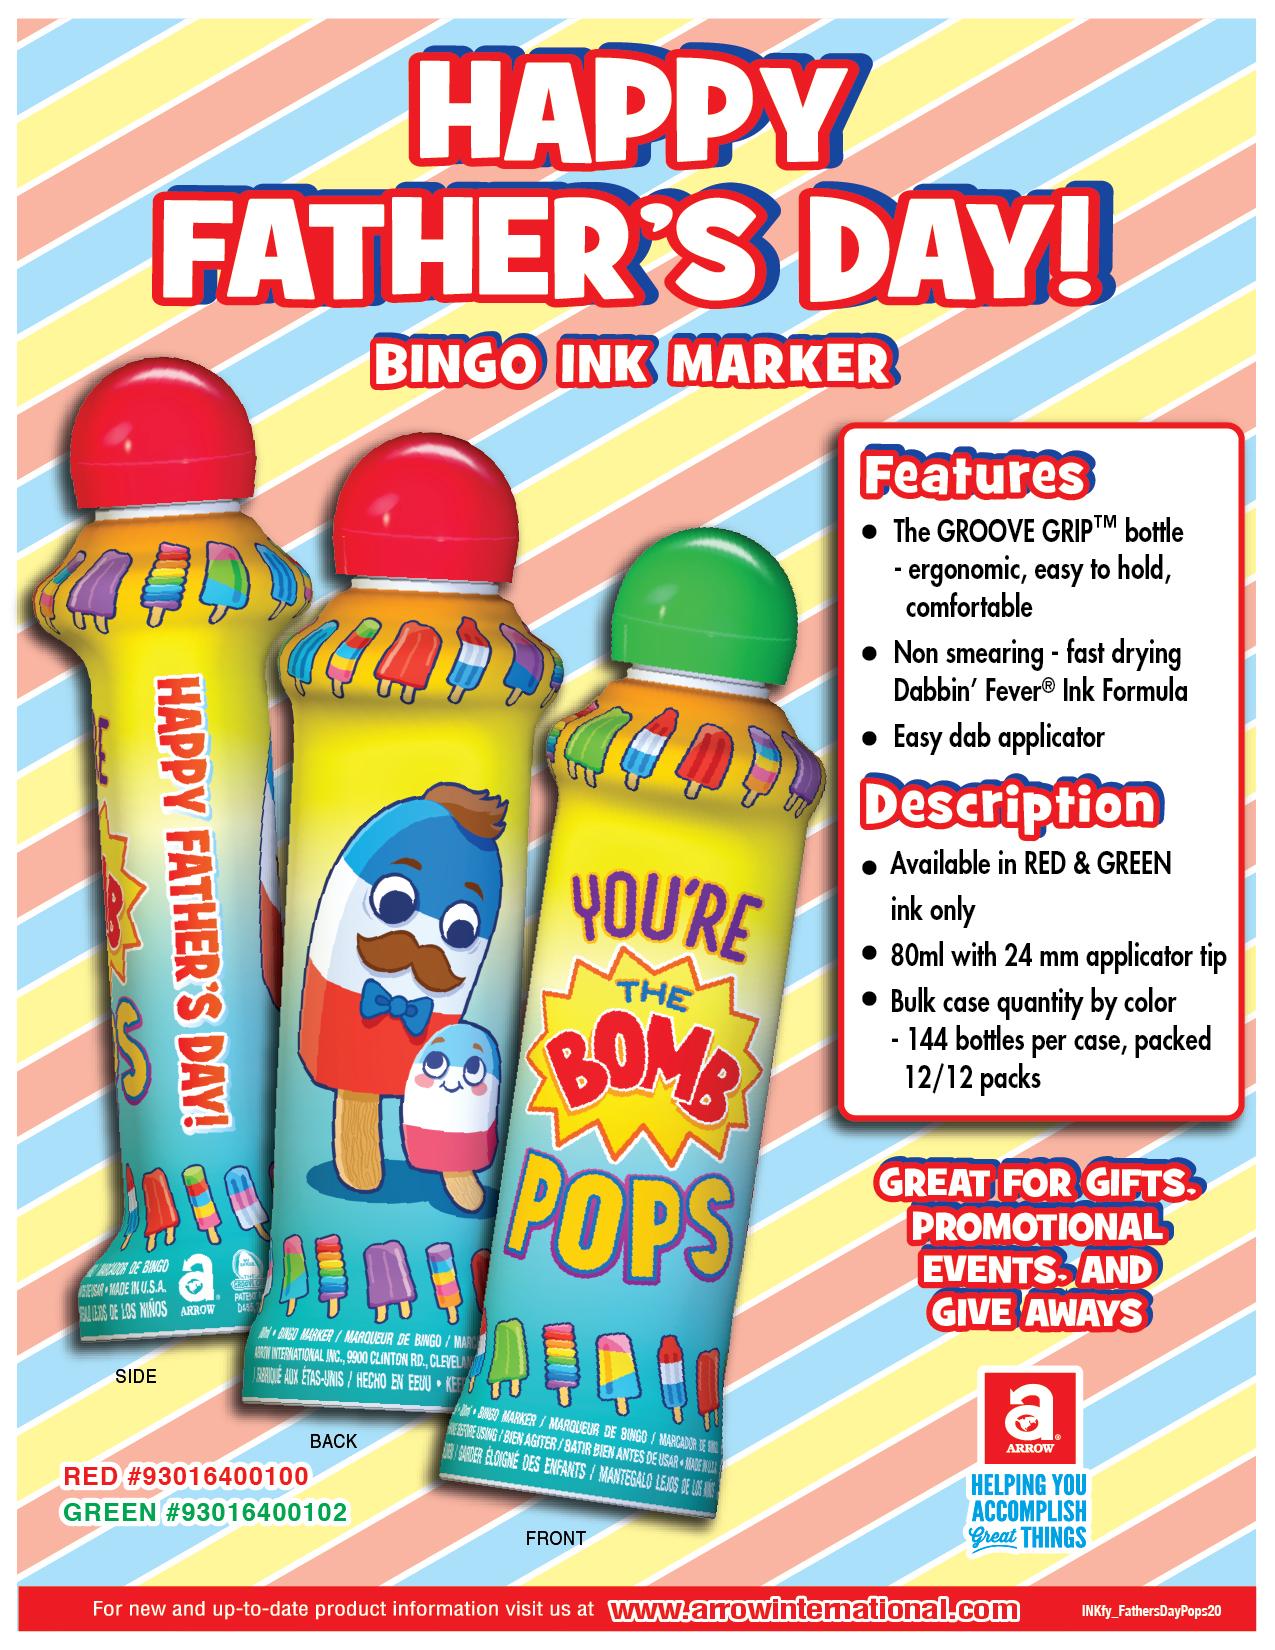 Father's Day Bingo Ink Marker